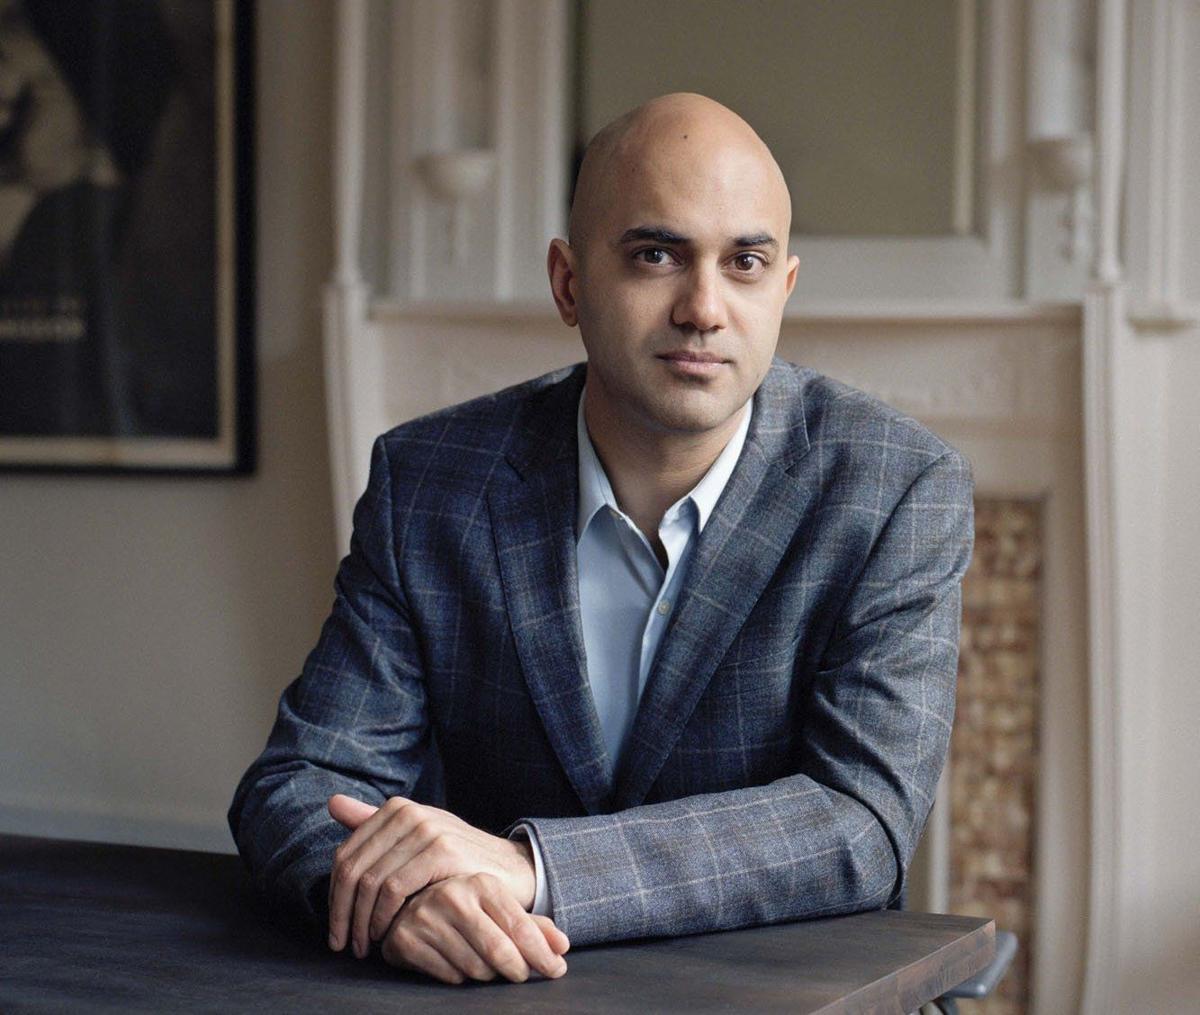 Jensen Lecture Series 2019 Speaker Ayad Akhtar, sitting at a desk